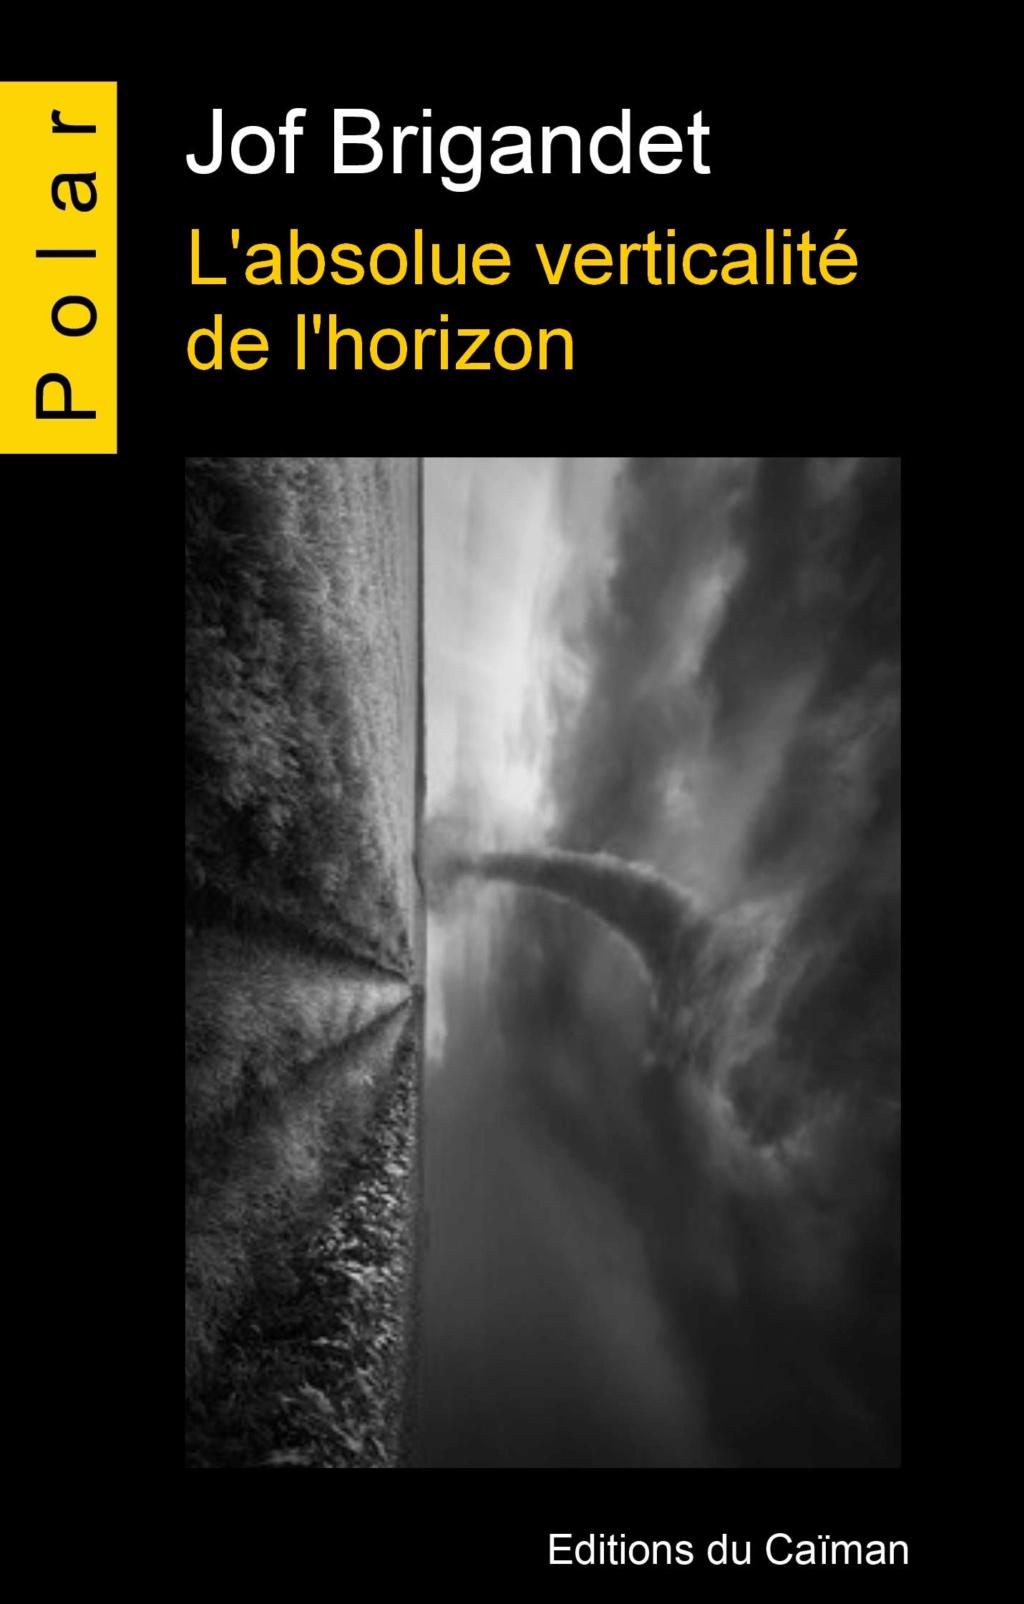 [Brigandet, Jof] L'absolue verticalité de l'horizon Vertic10